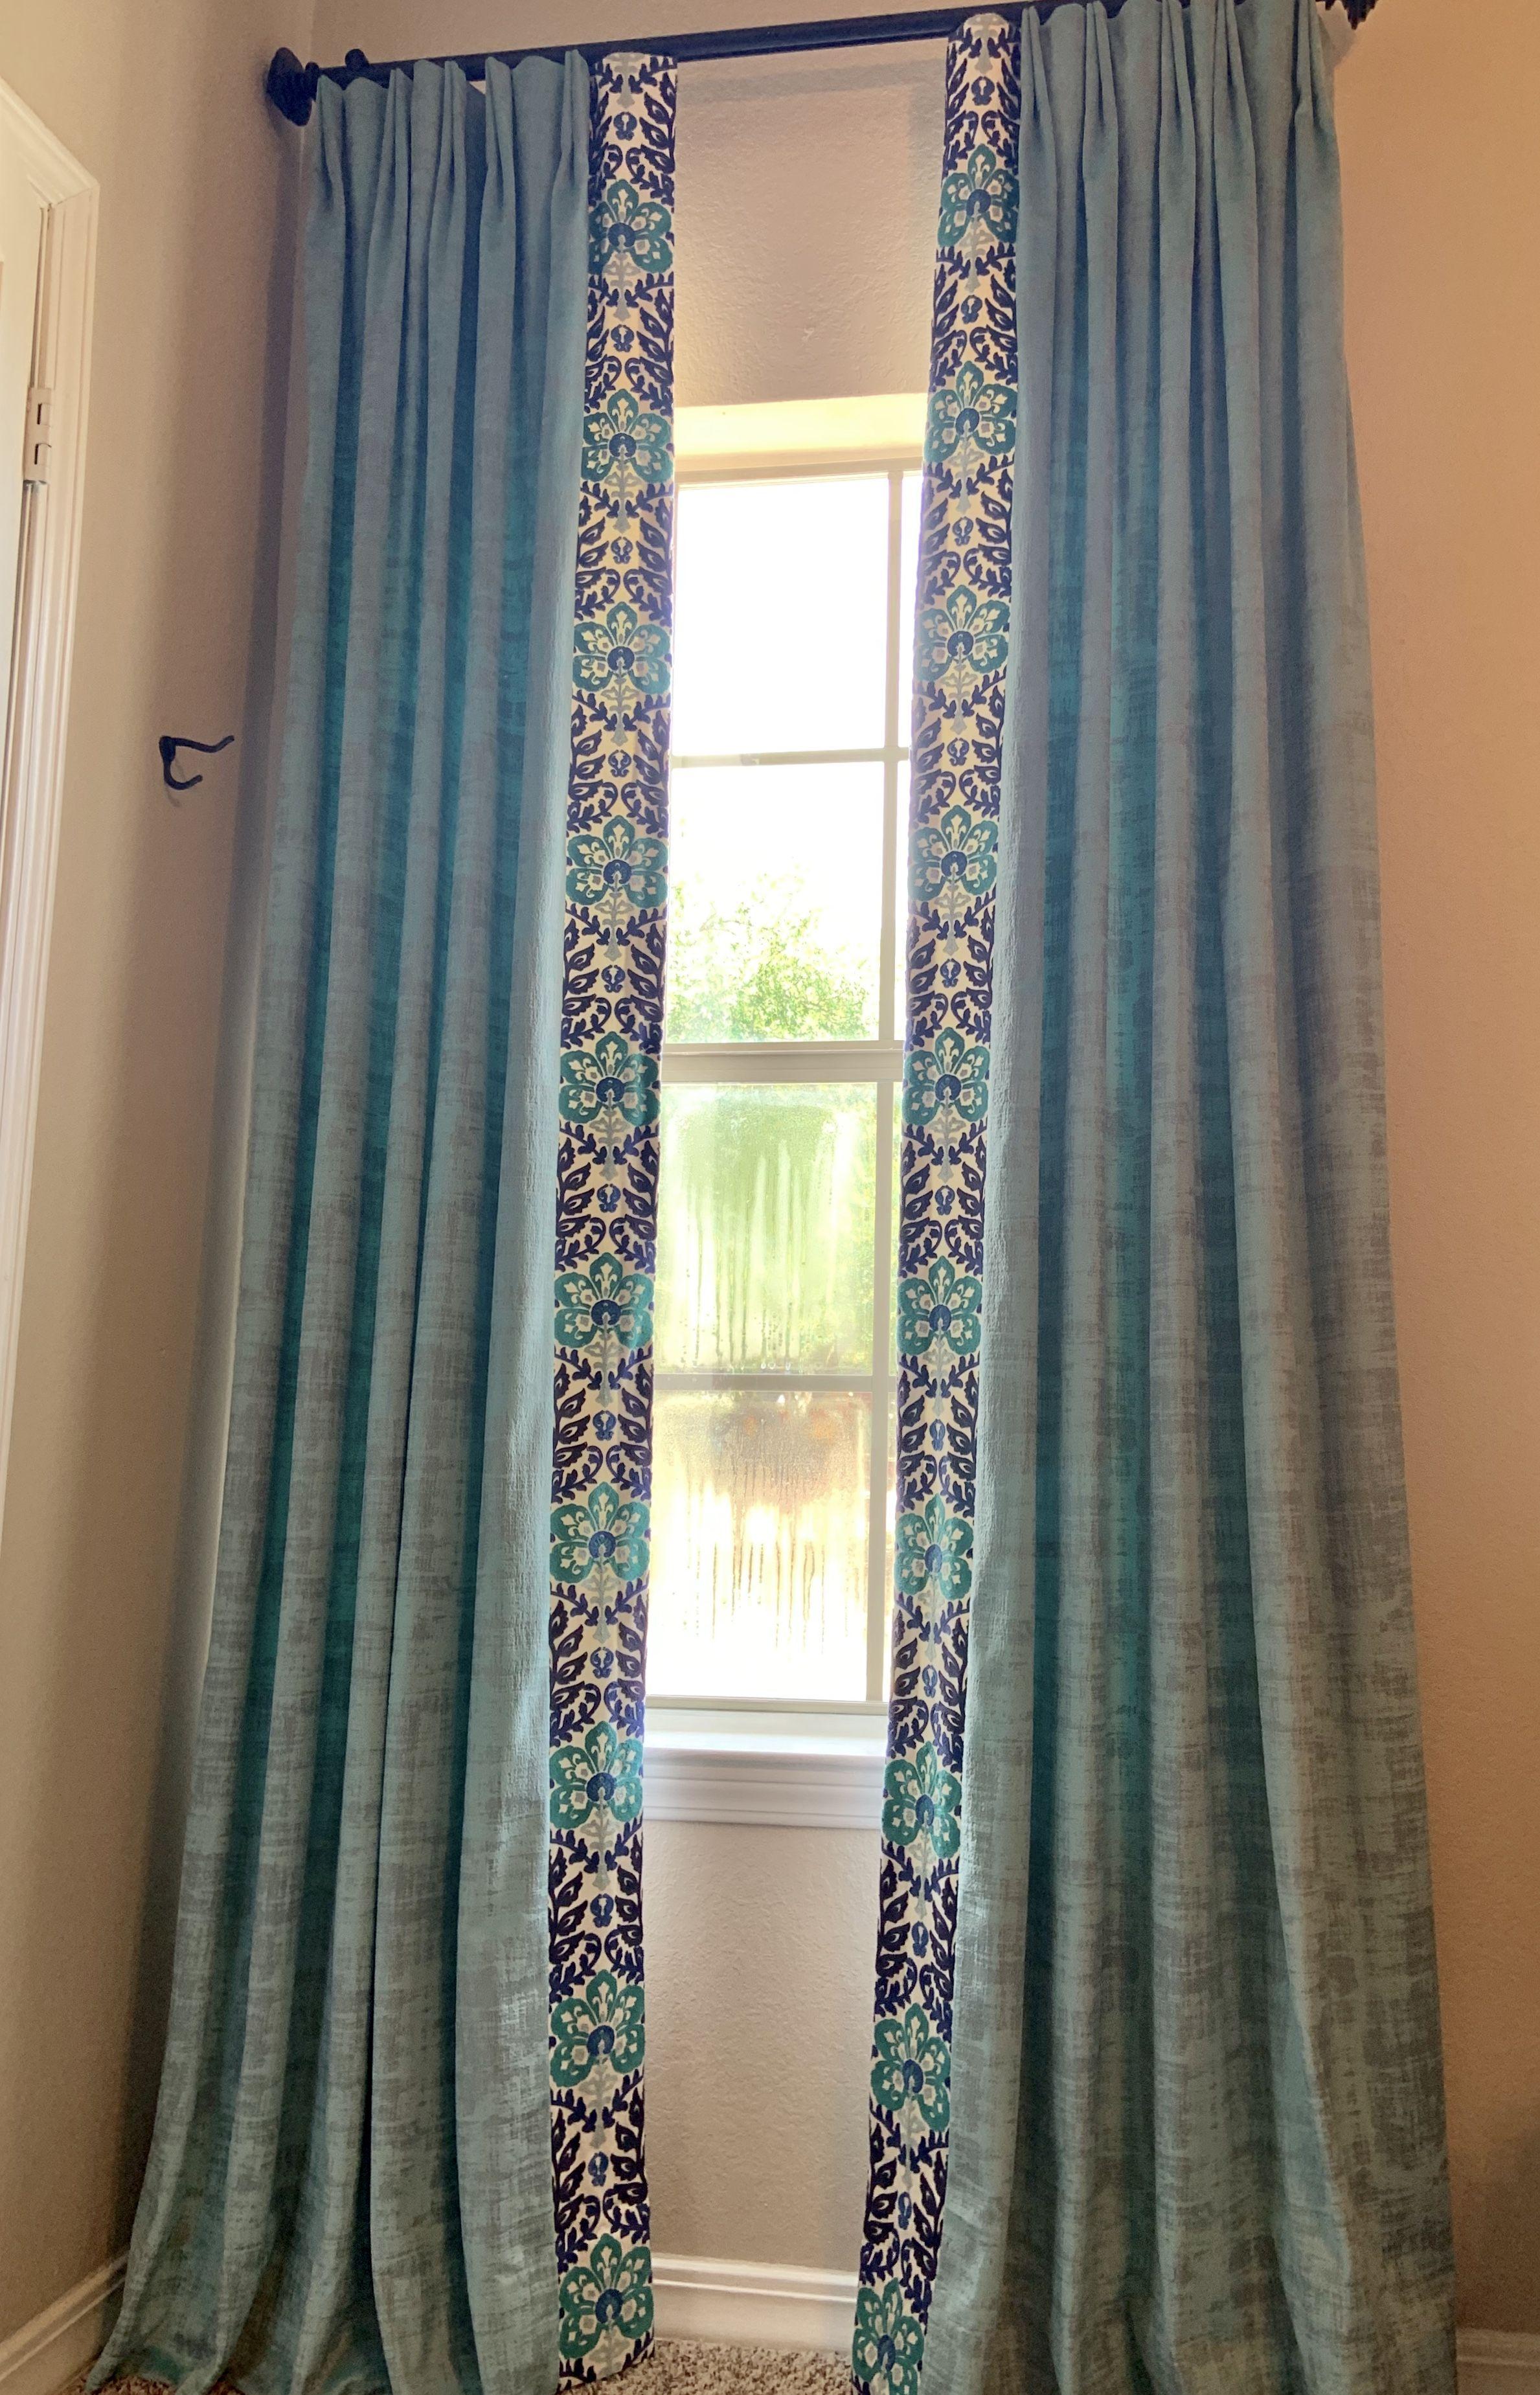 Designer Drapery Curtains Living Room Decor Curtains Luxury Curtains Living Room Drapery Designs